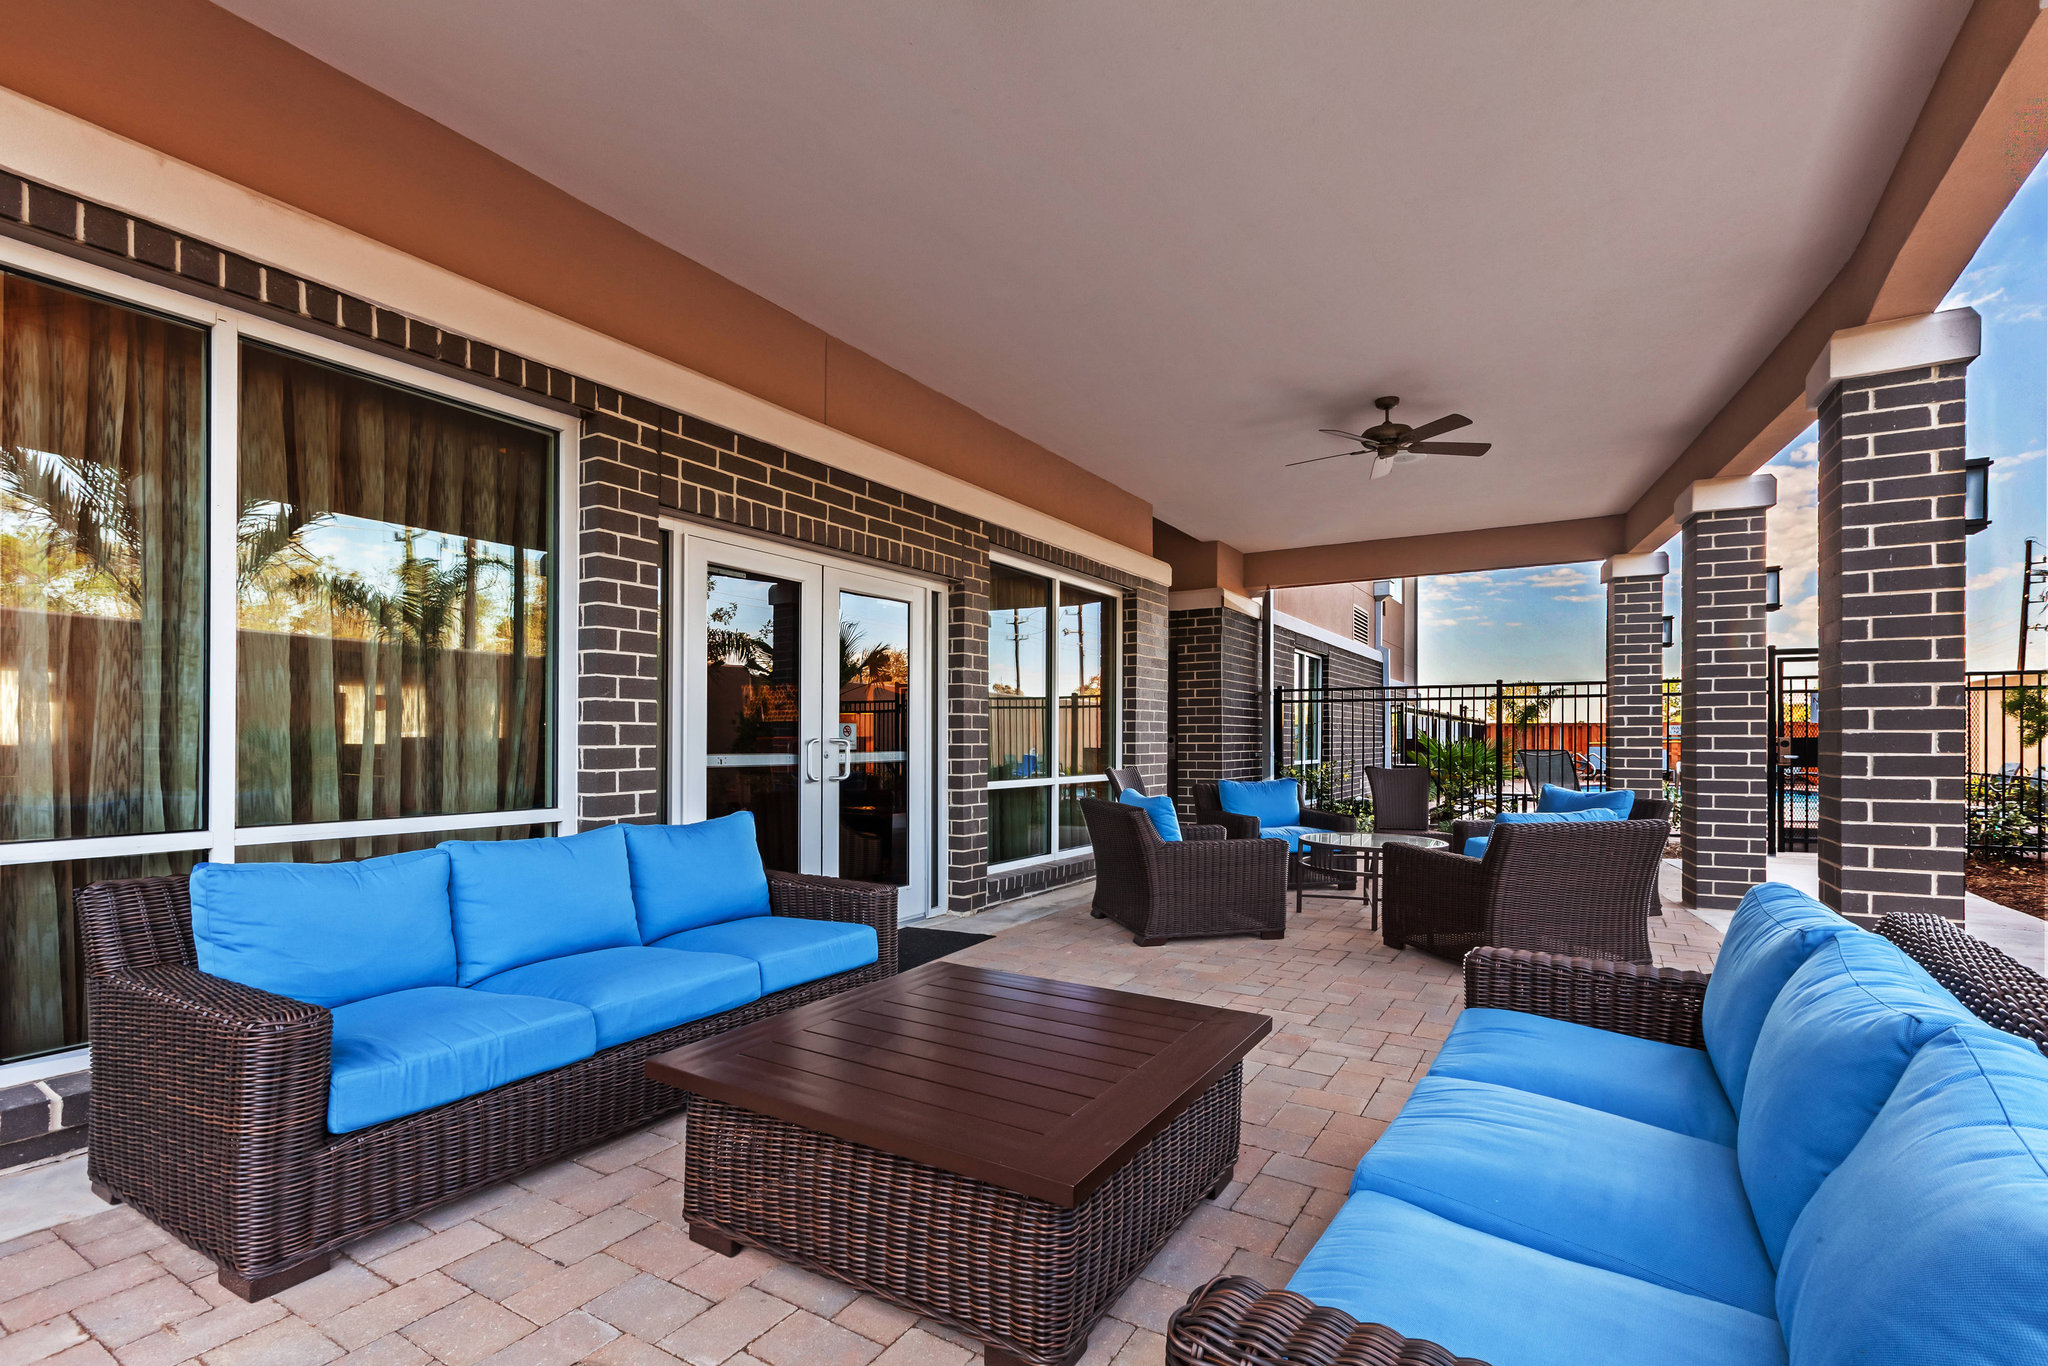 Courtyard by Marriott Houston I-10 West Park Row